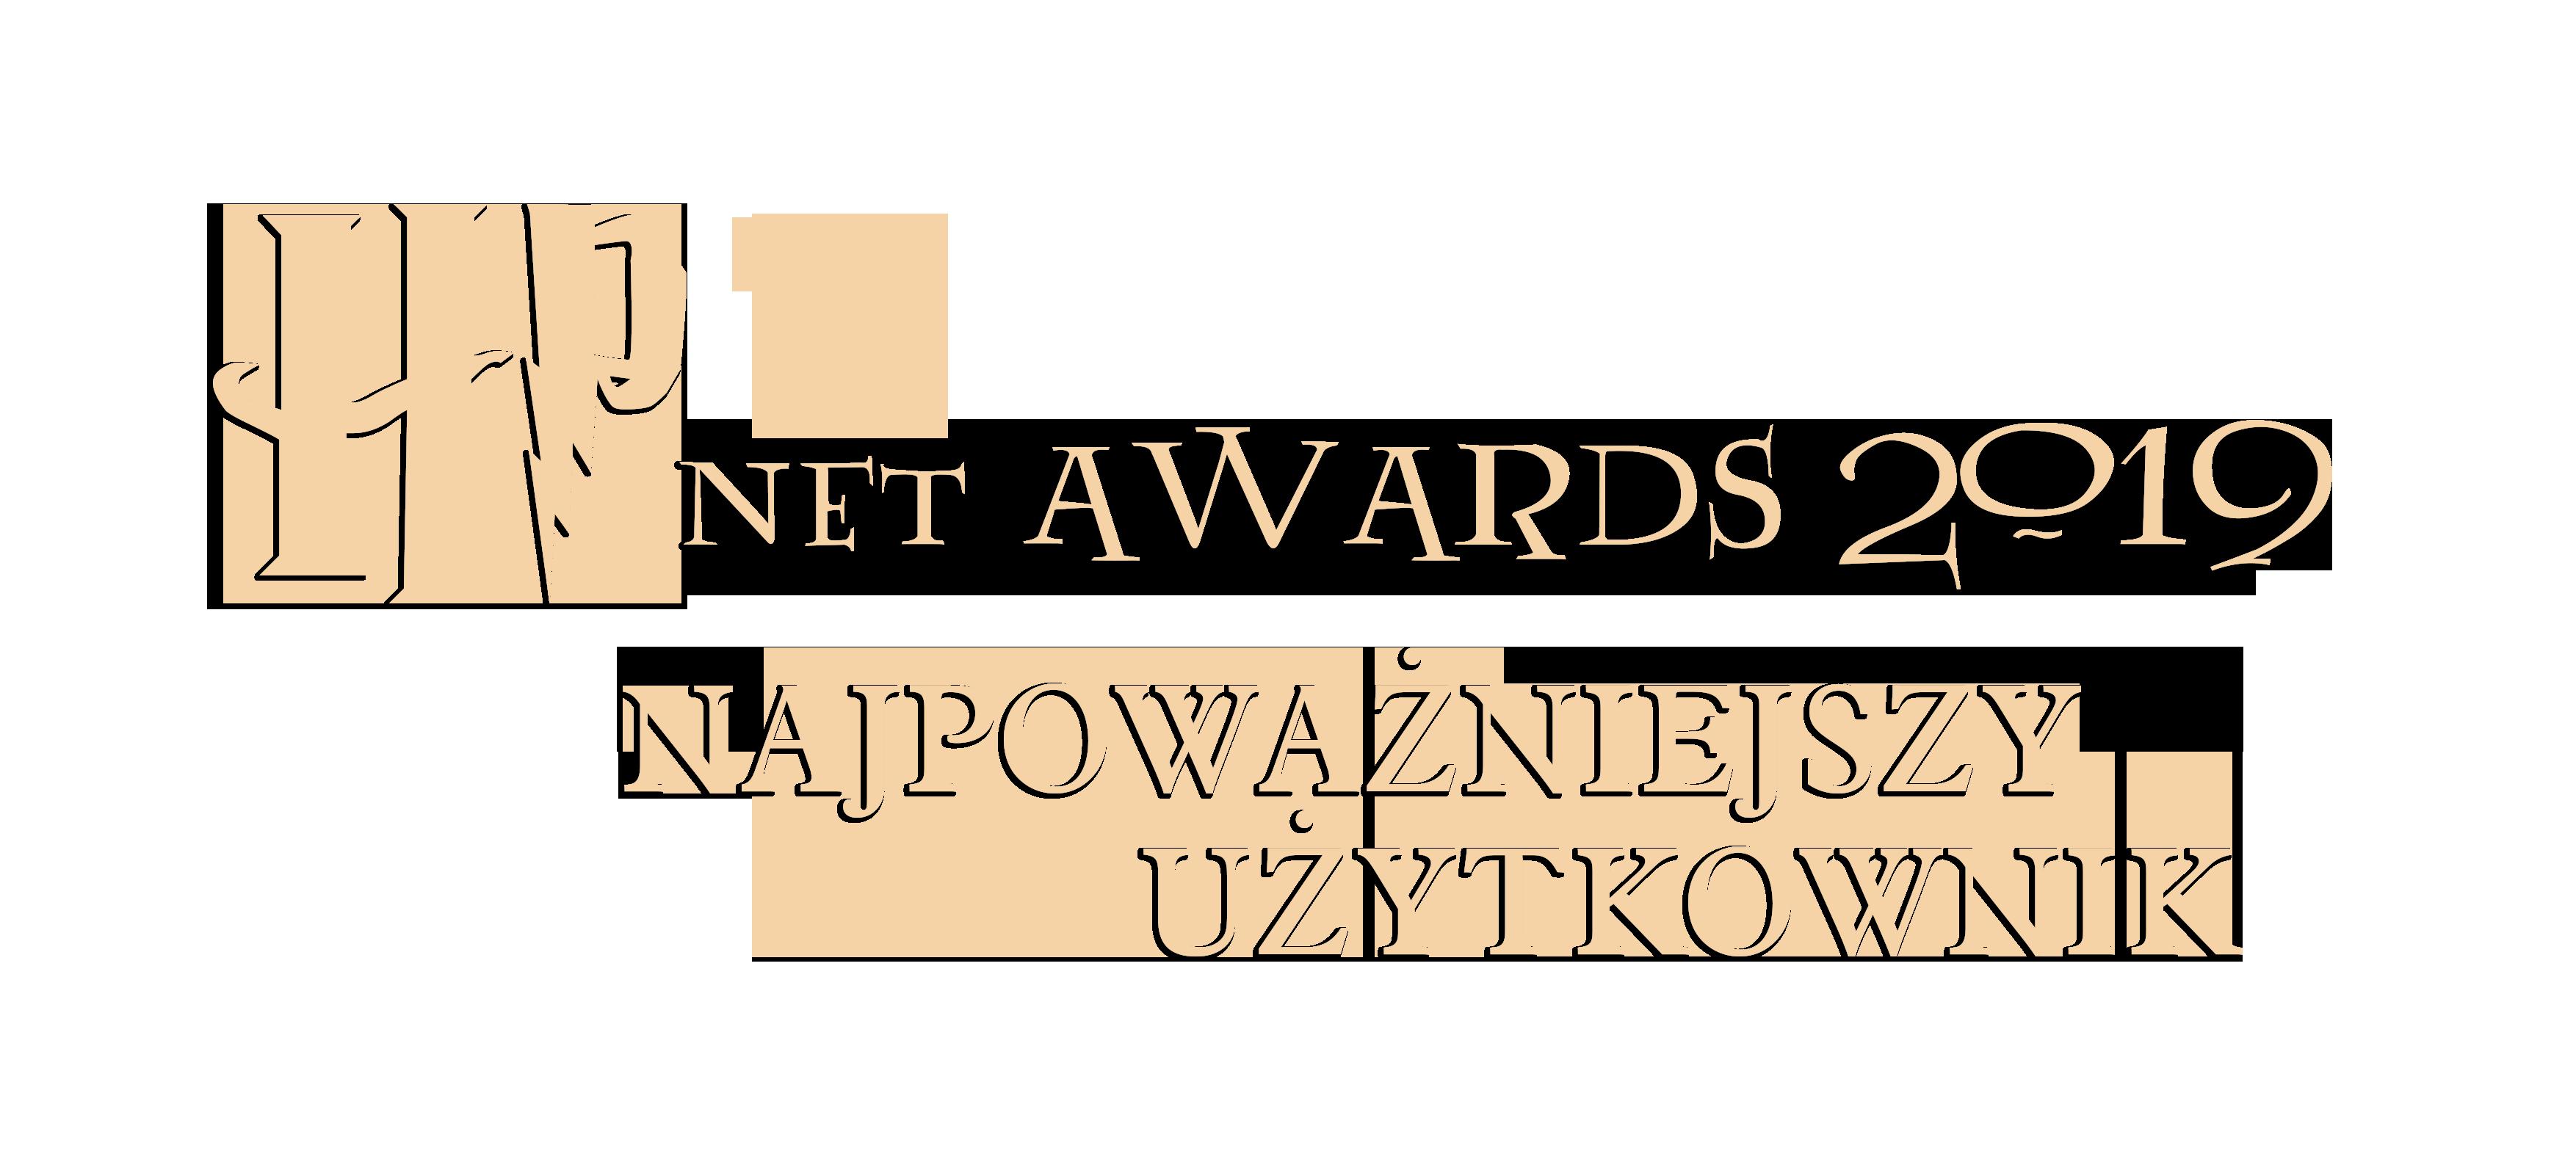 www.harry-potter.net.pl/images/articles/powazny.png